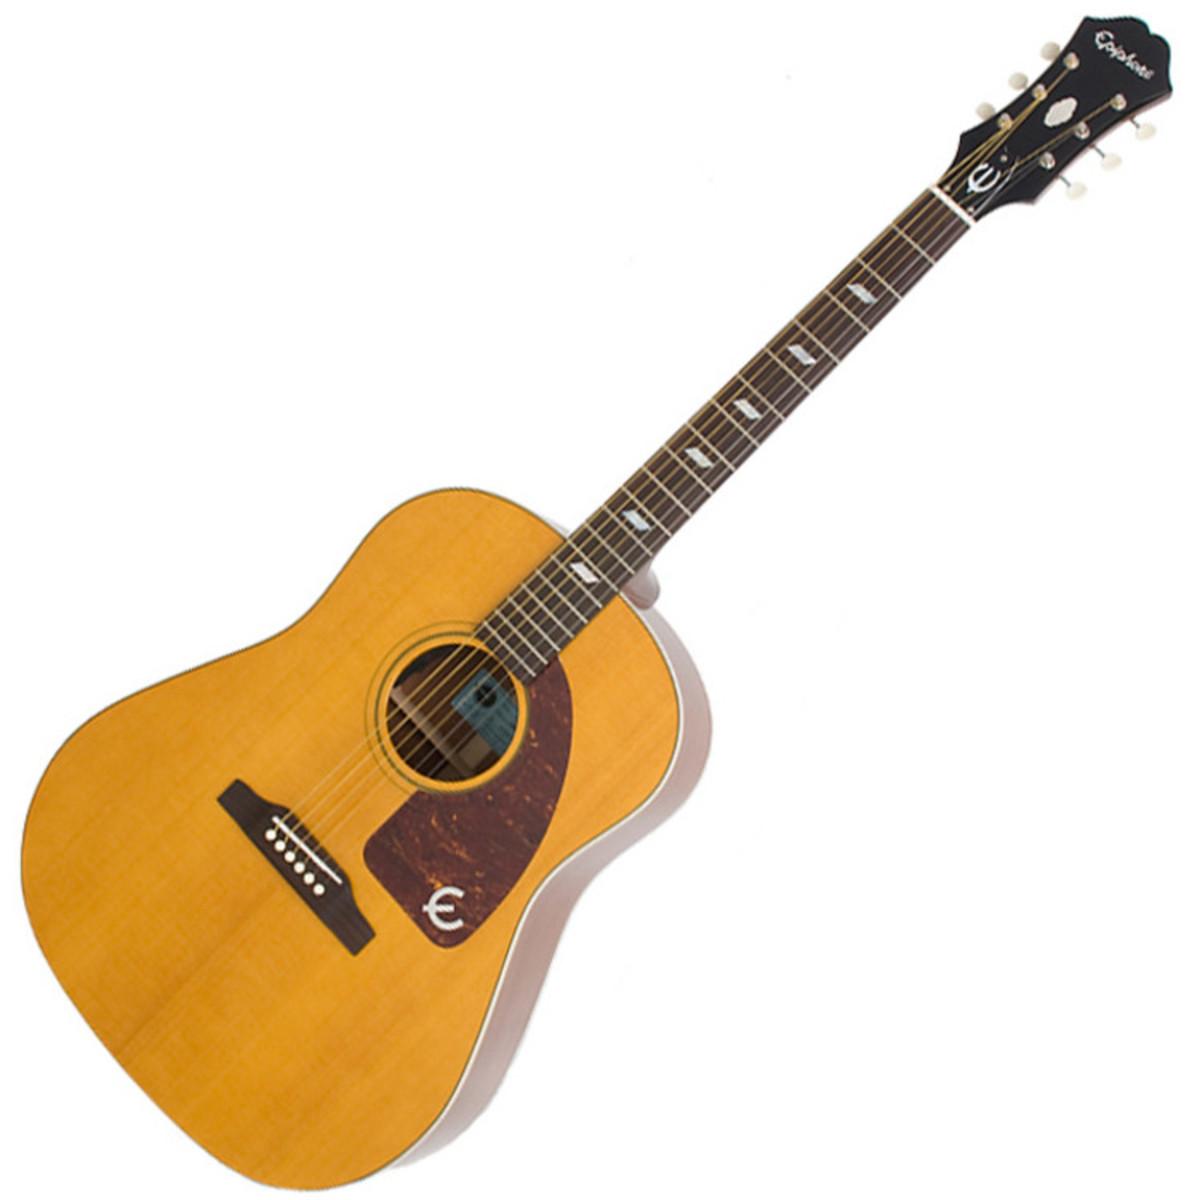 epiphone inspir par 1964 texan guitare lectro. Black Bedroom Furniture Sets. Home Design Ideas